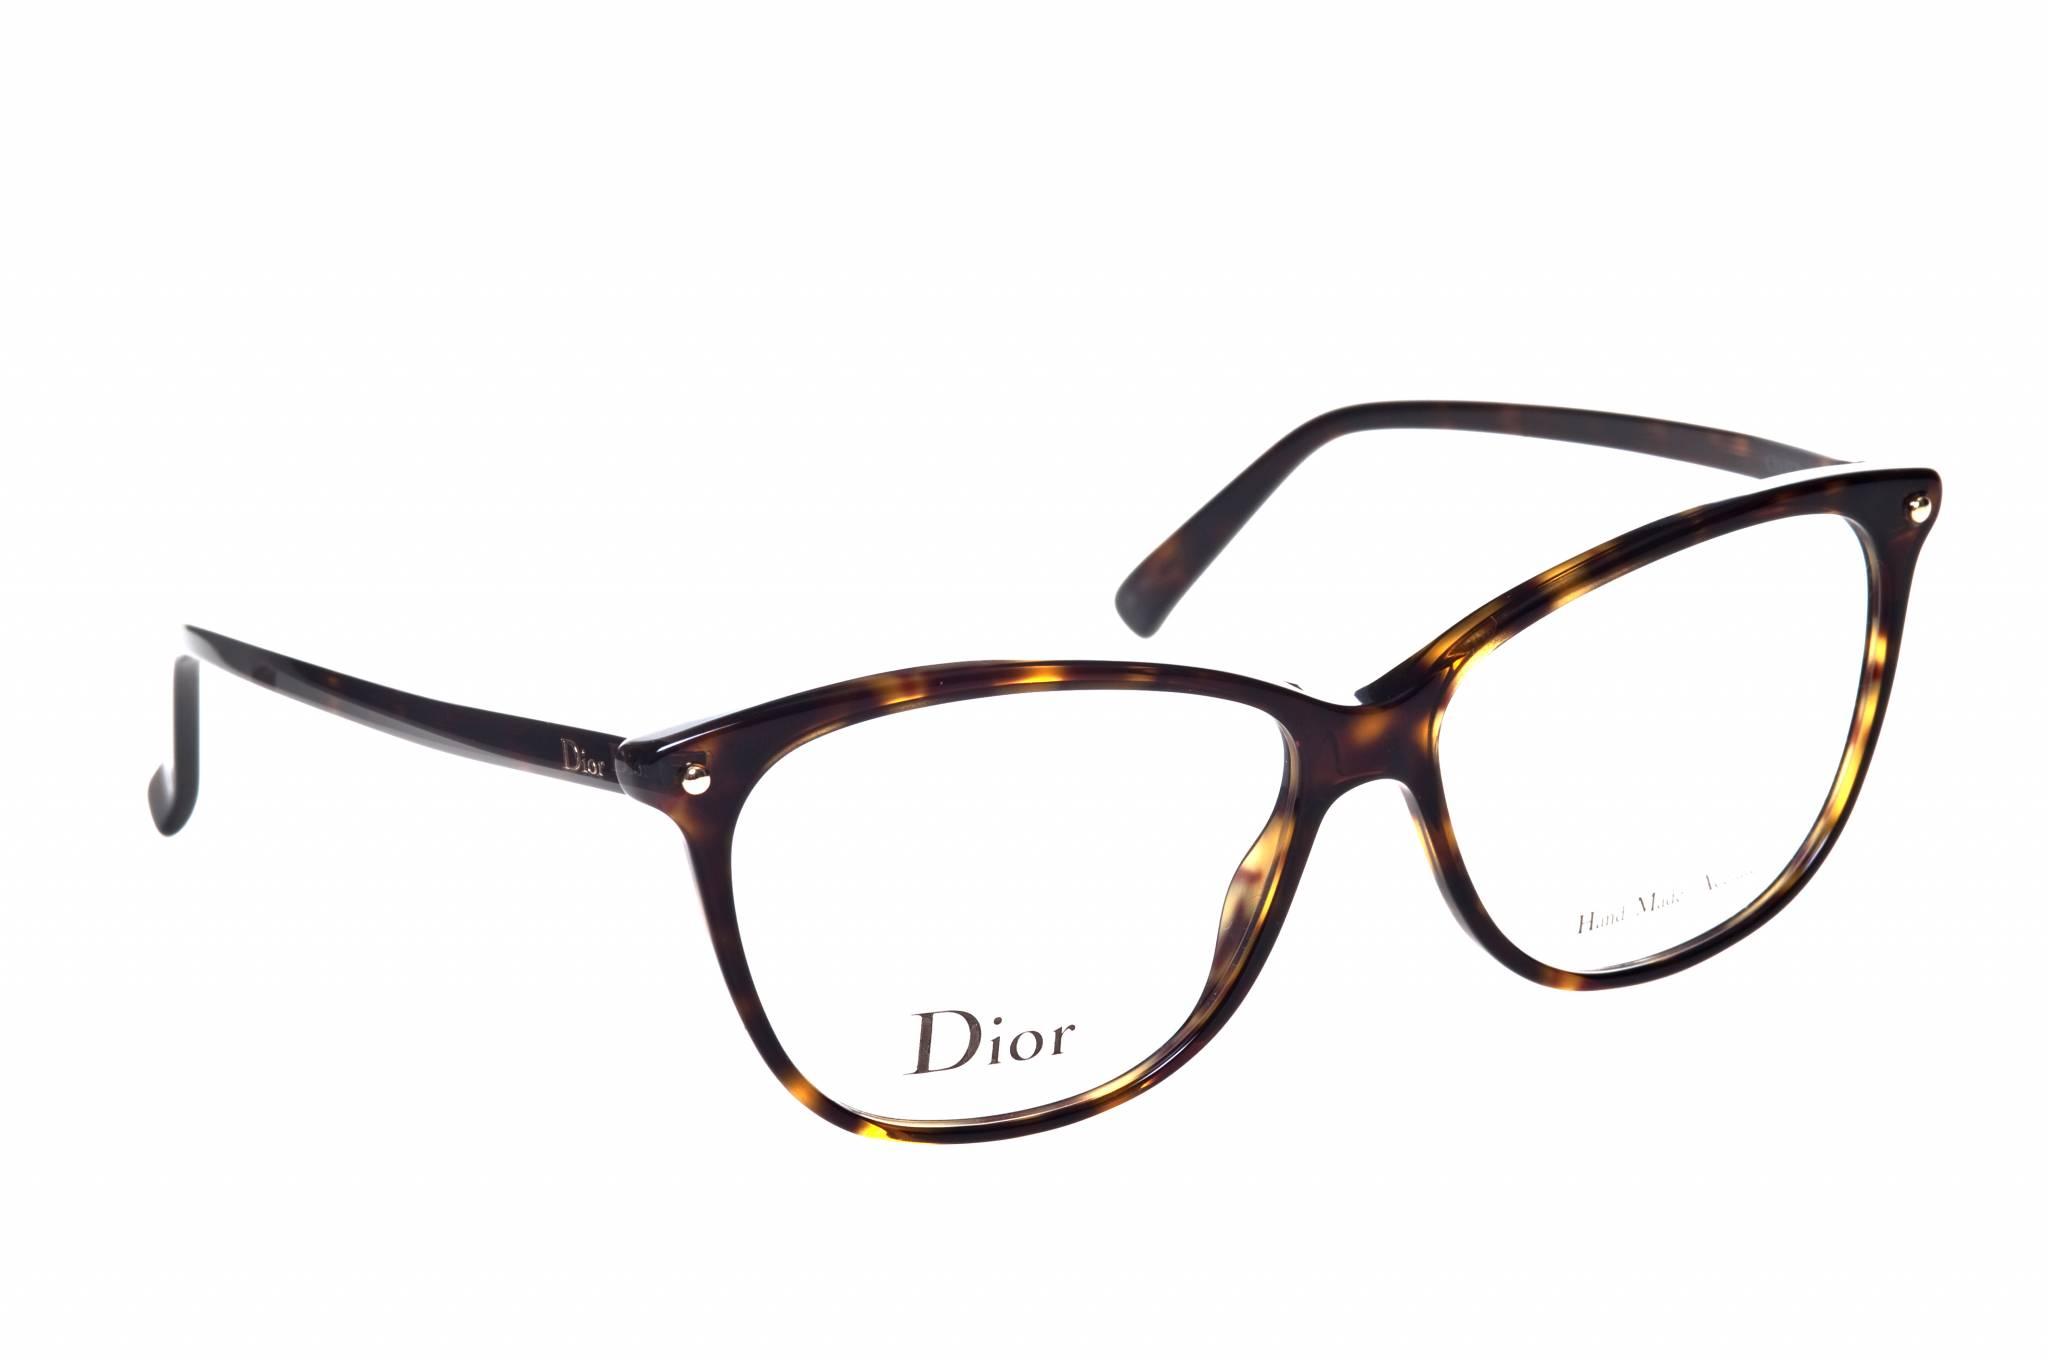 Dior Brille cd3270 086